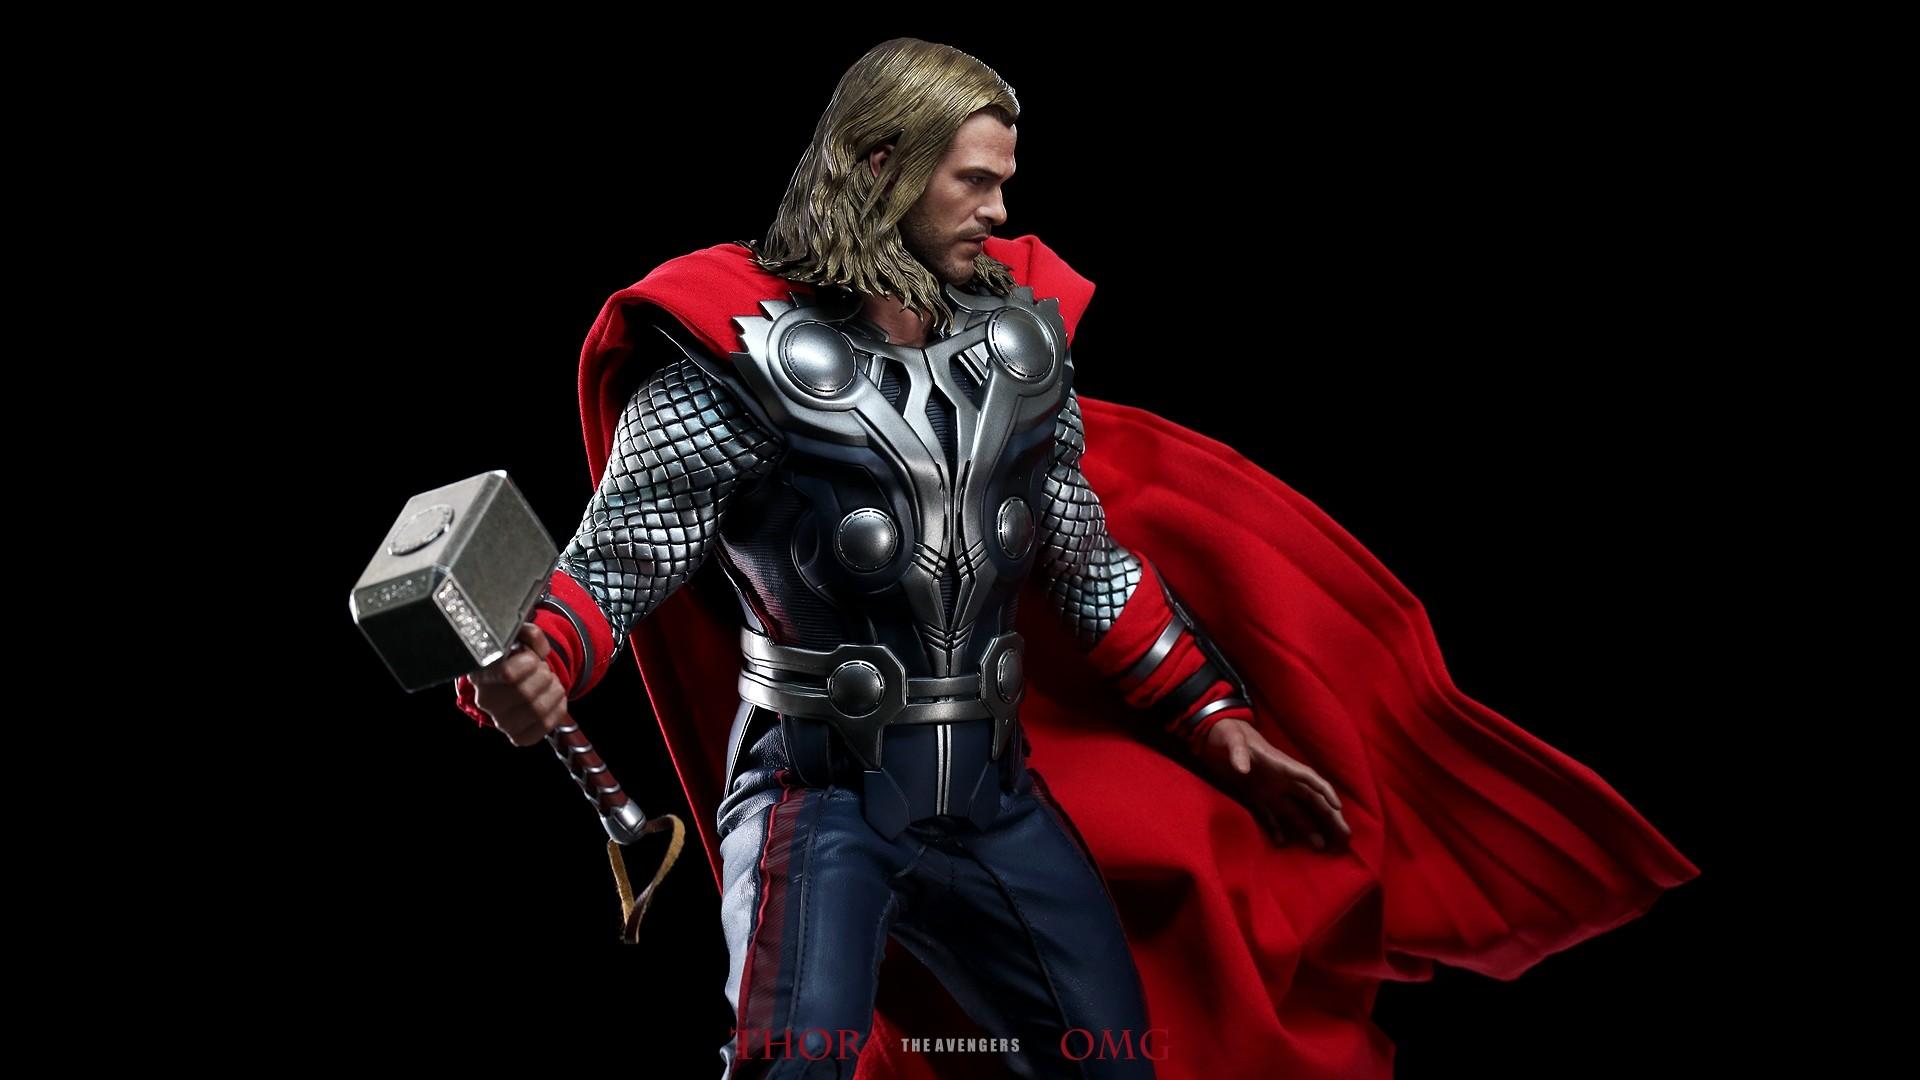 Thors Hammer Wallpaper (77+ images)